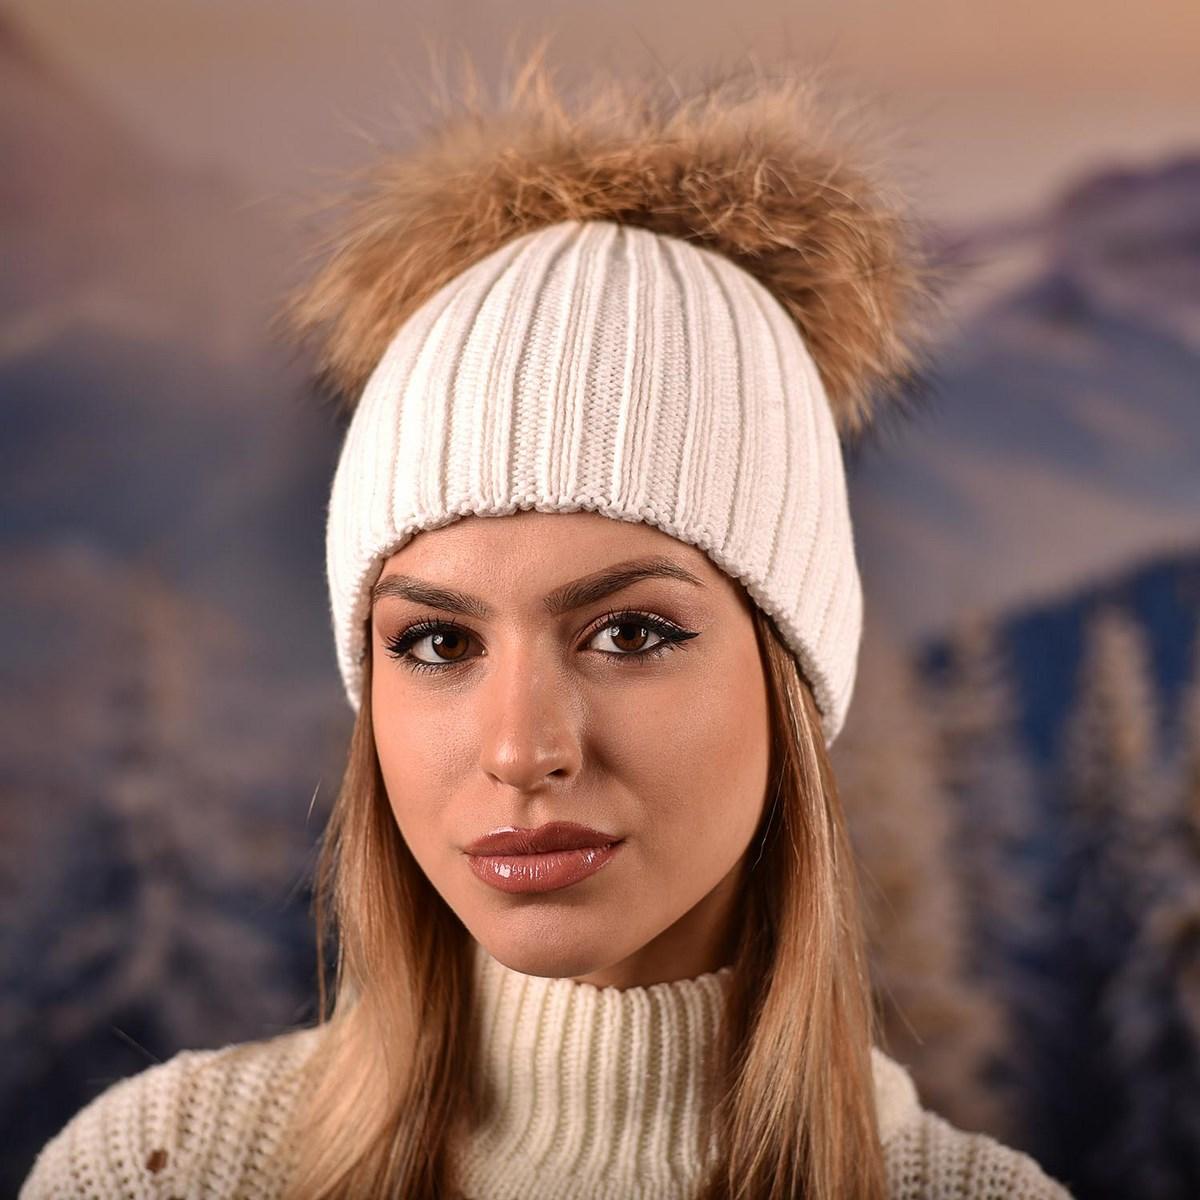 Дамска Зимна Бяла шапка с два естествени помпона